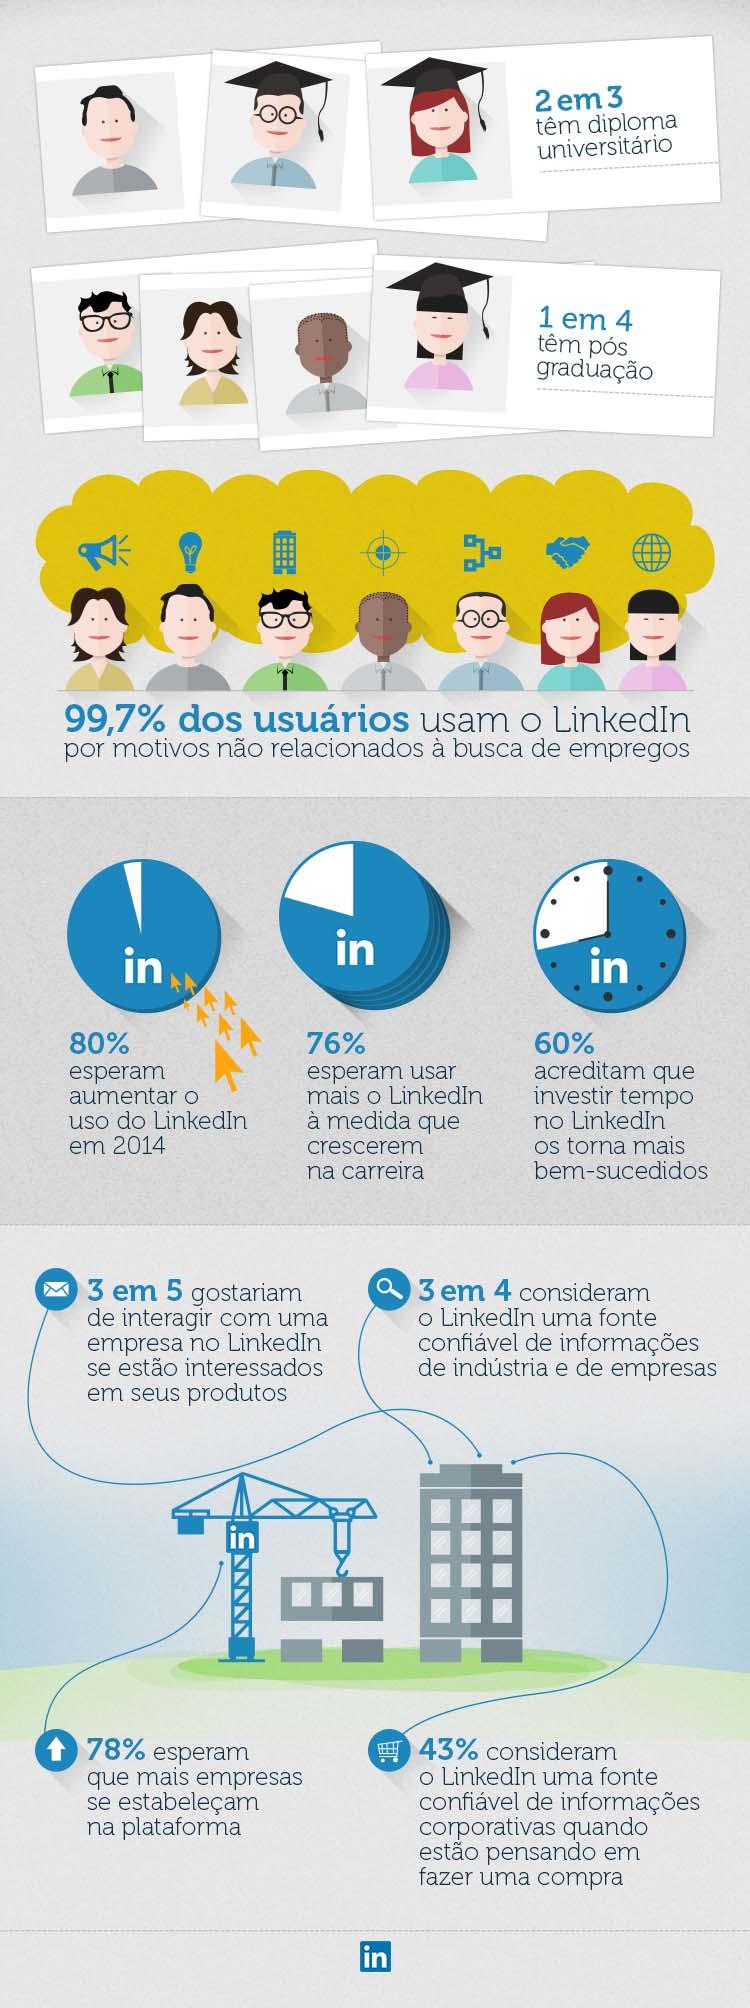 InfograficoLinkedinPerfilUsuarios2